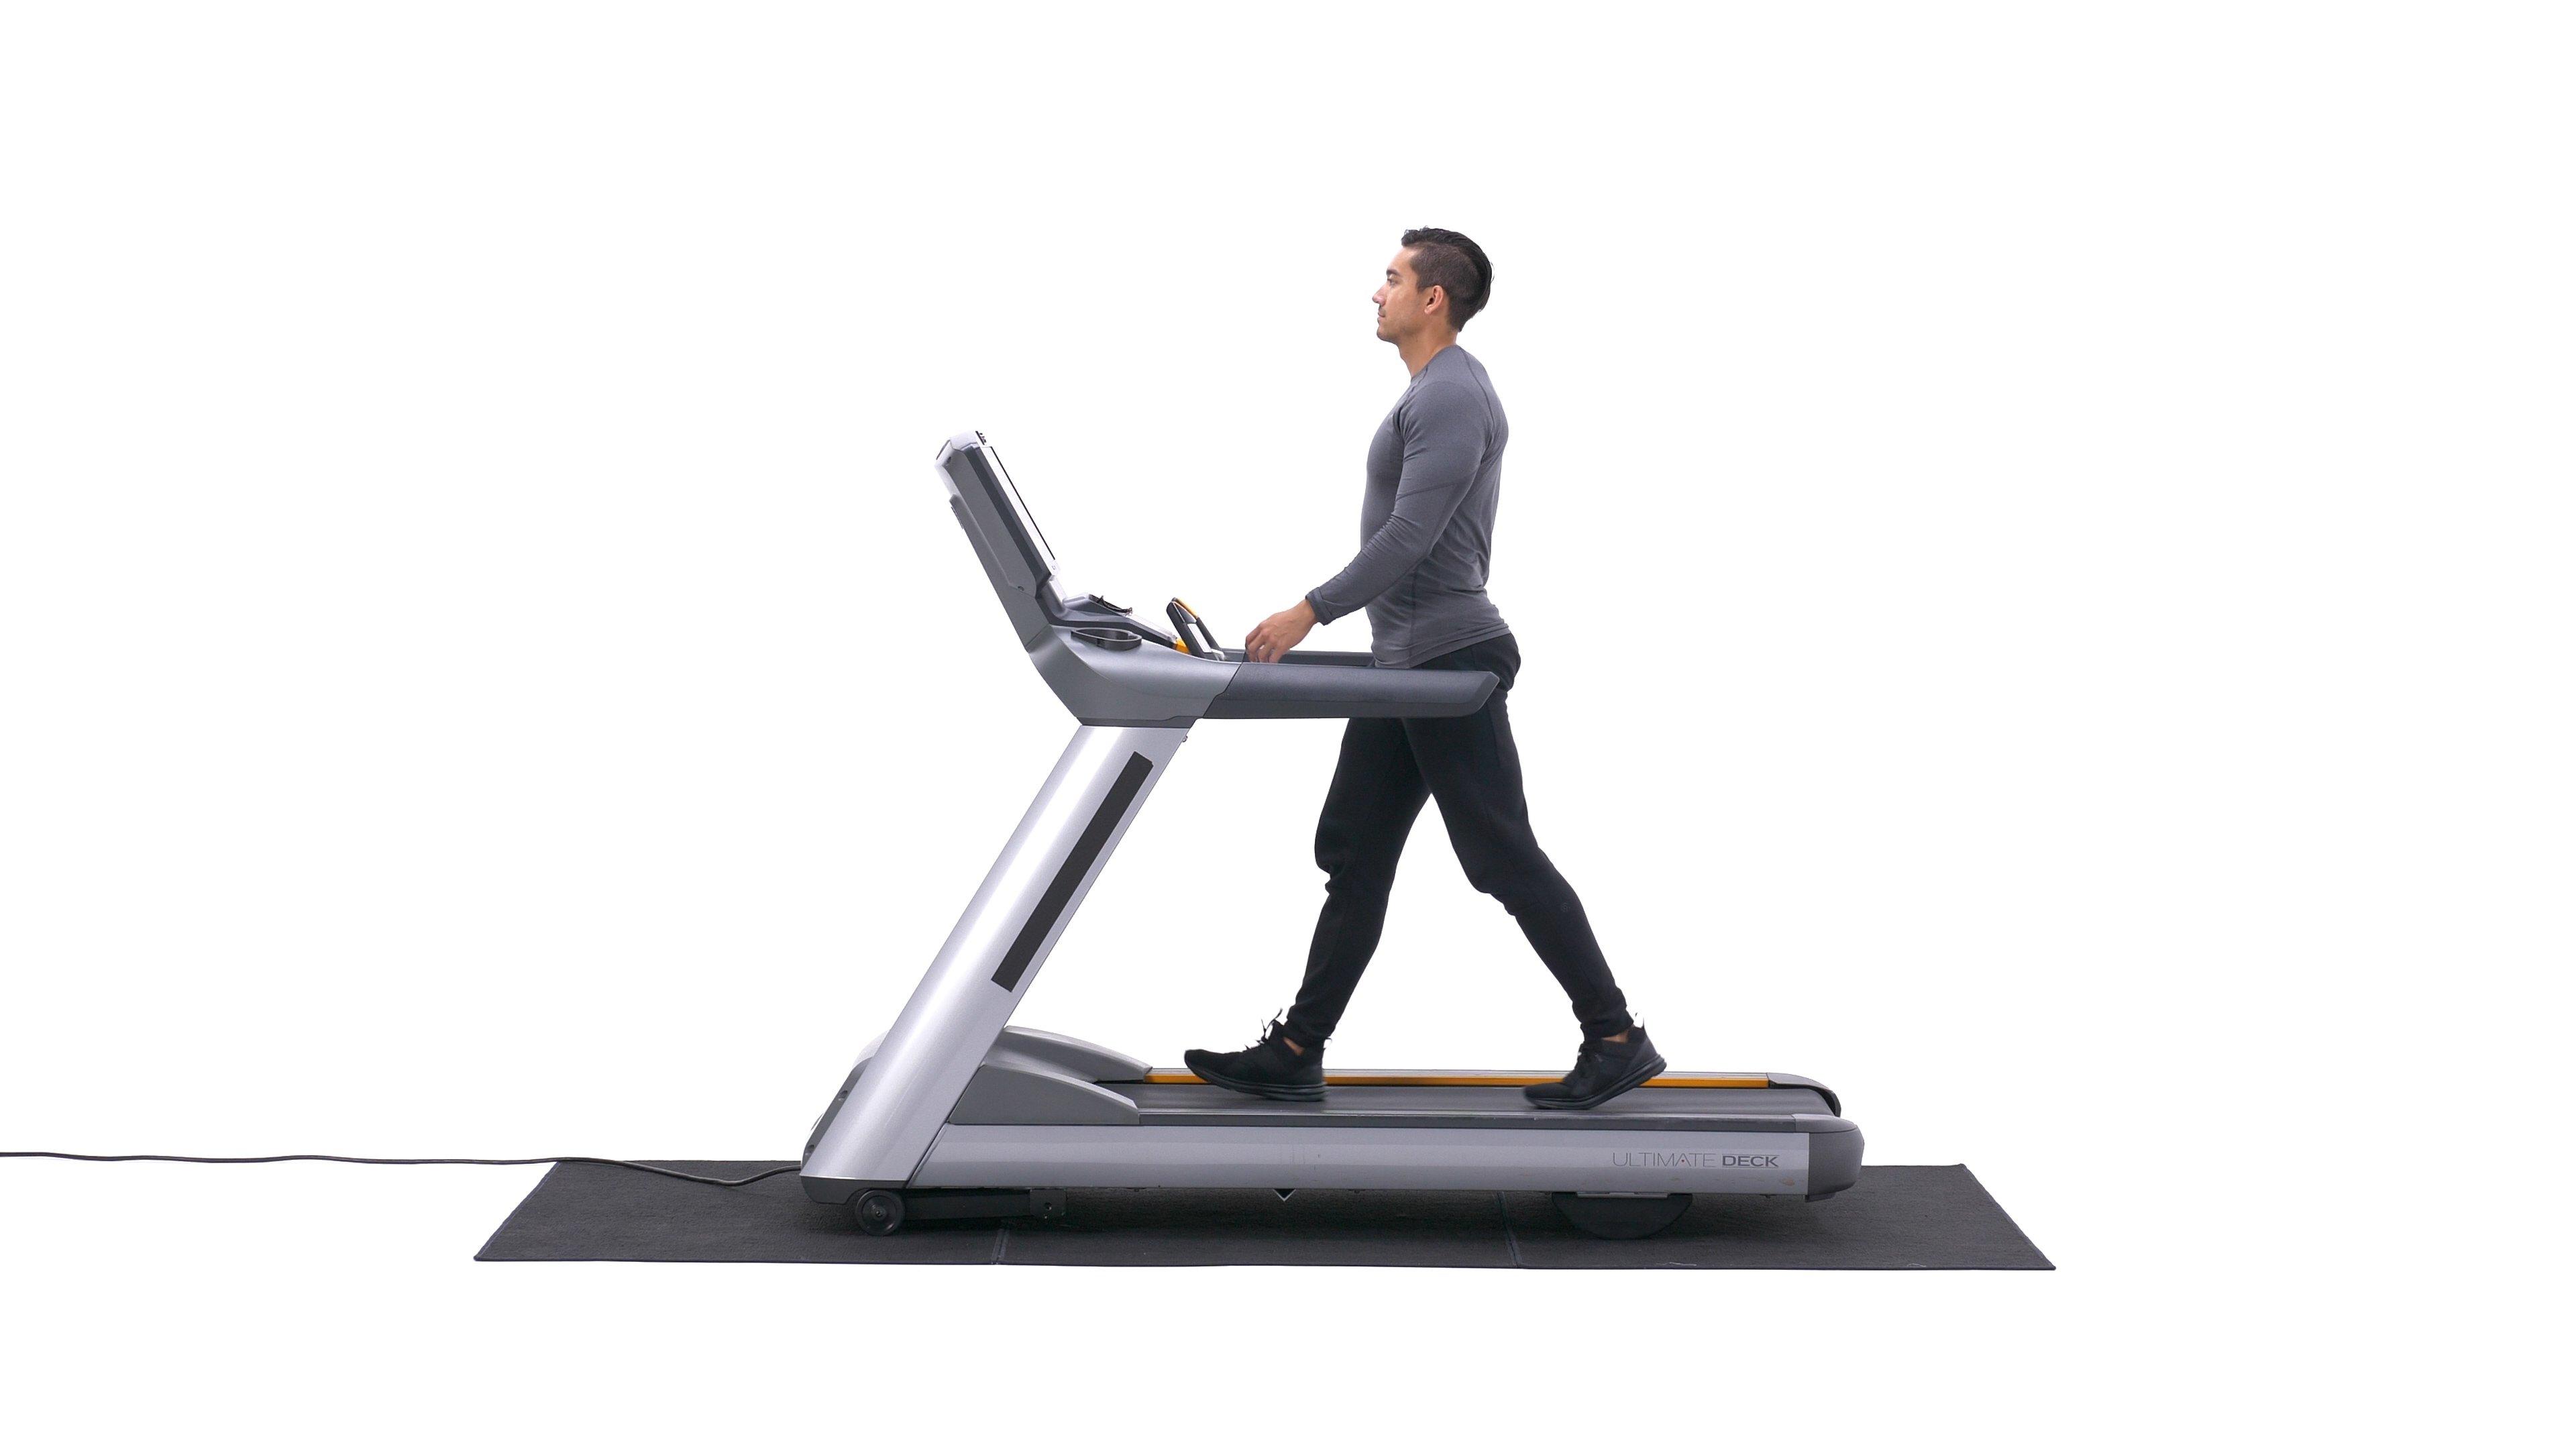 Treadmill walking image